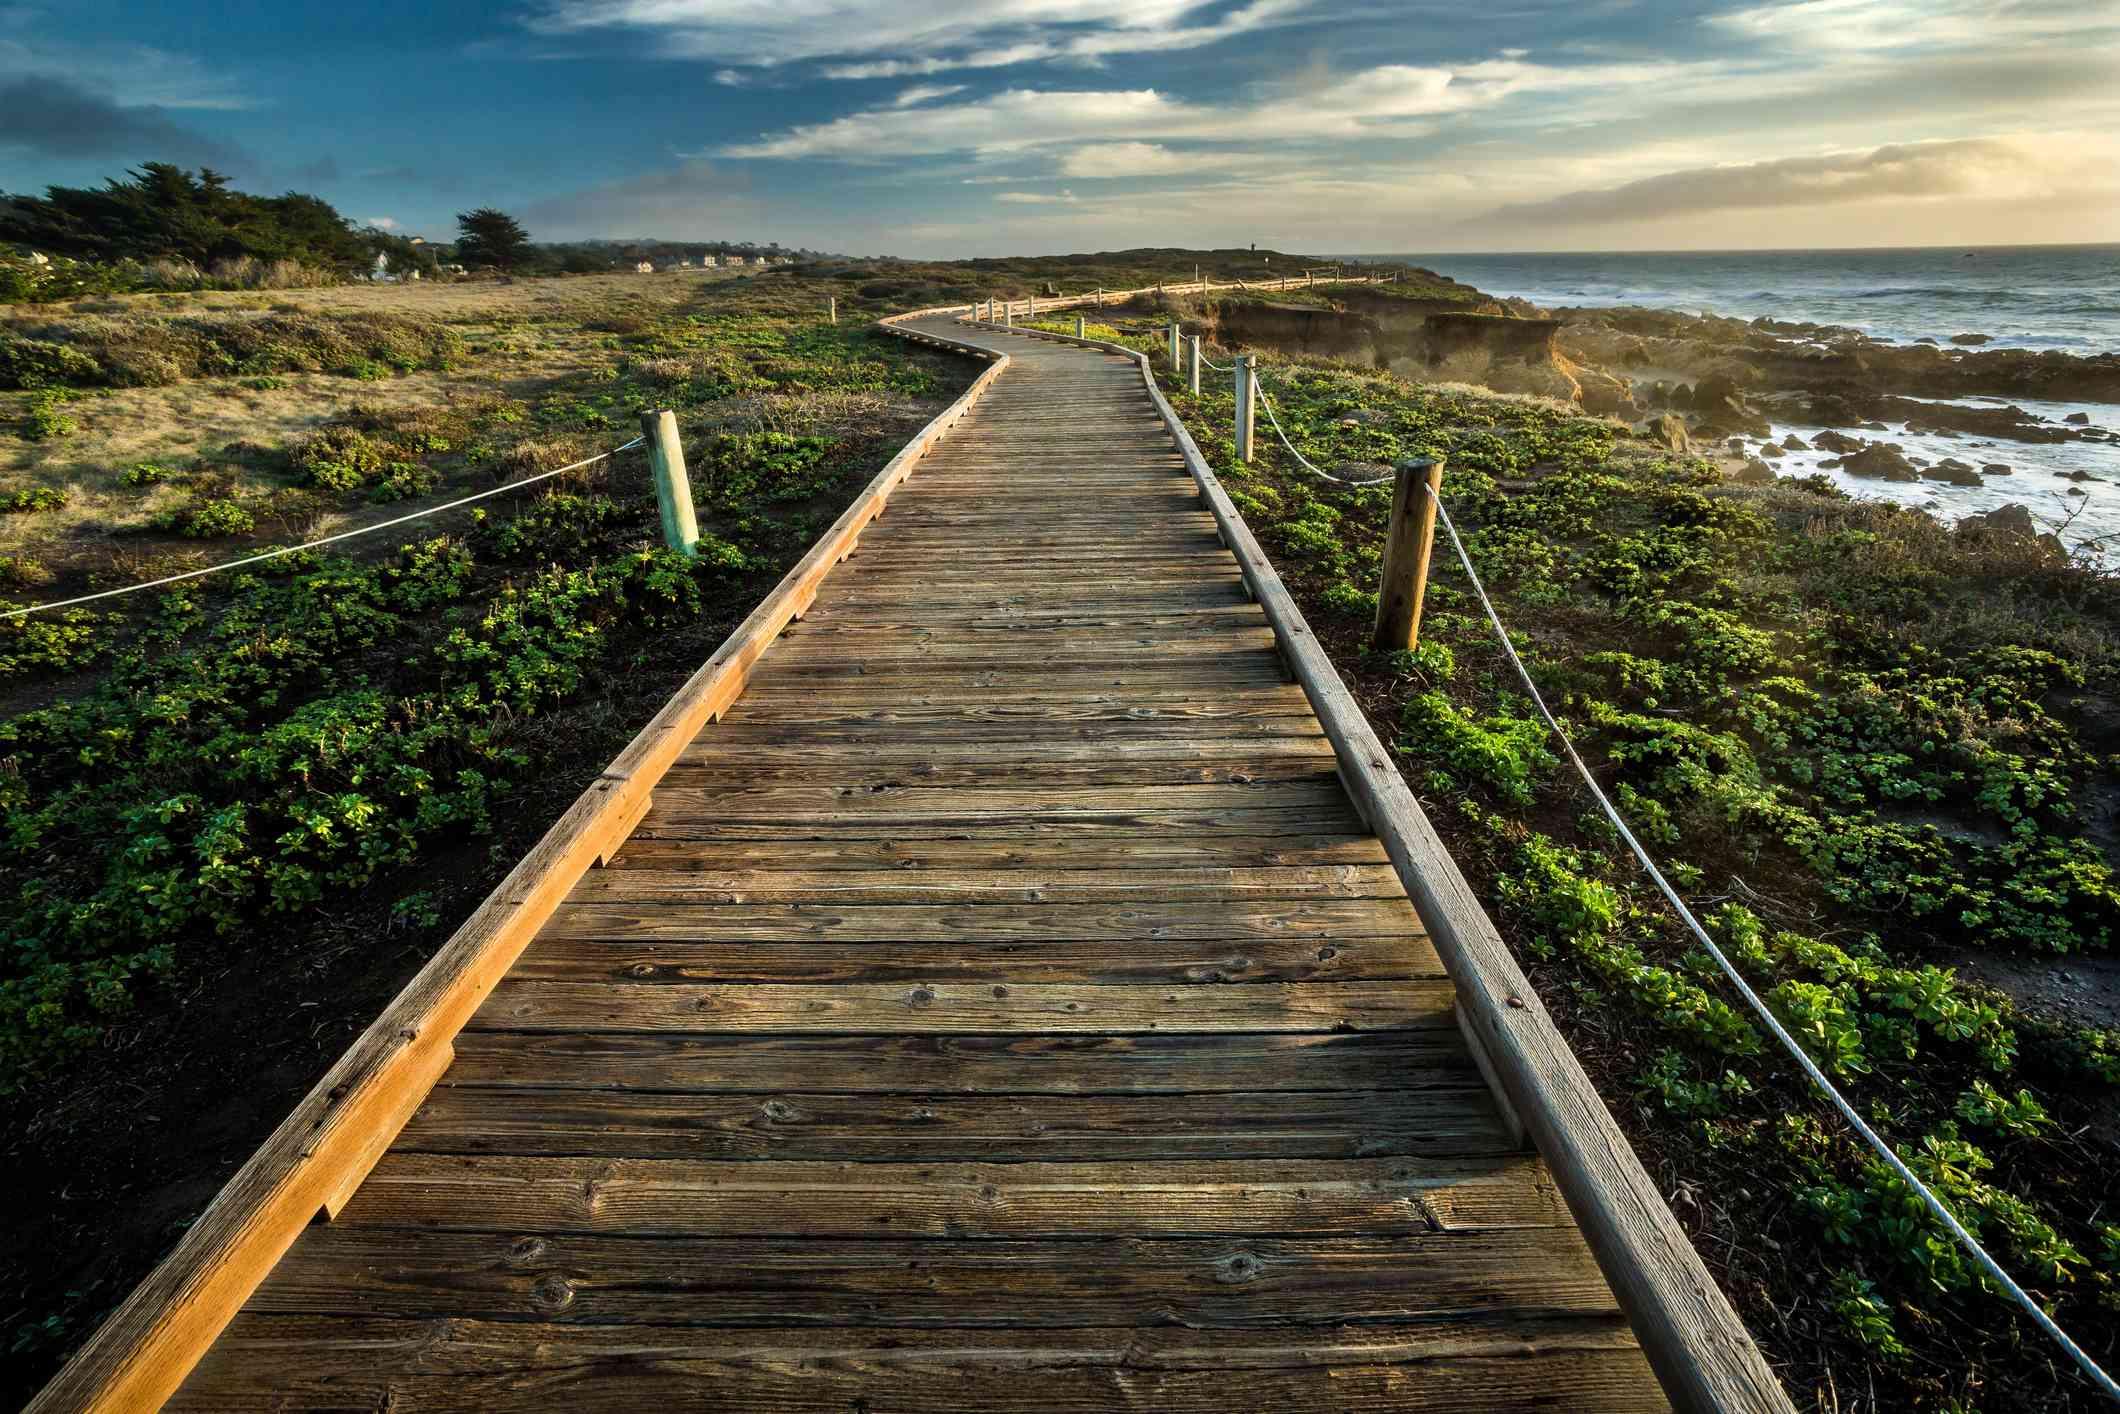 Moonstone Beach Boardwalk near San Simeon, California